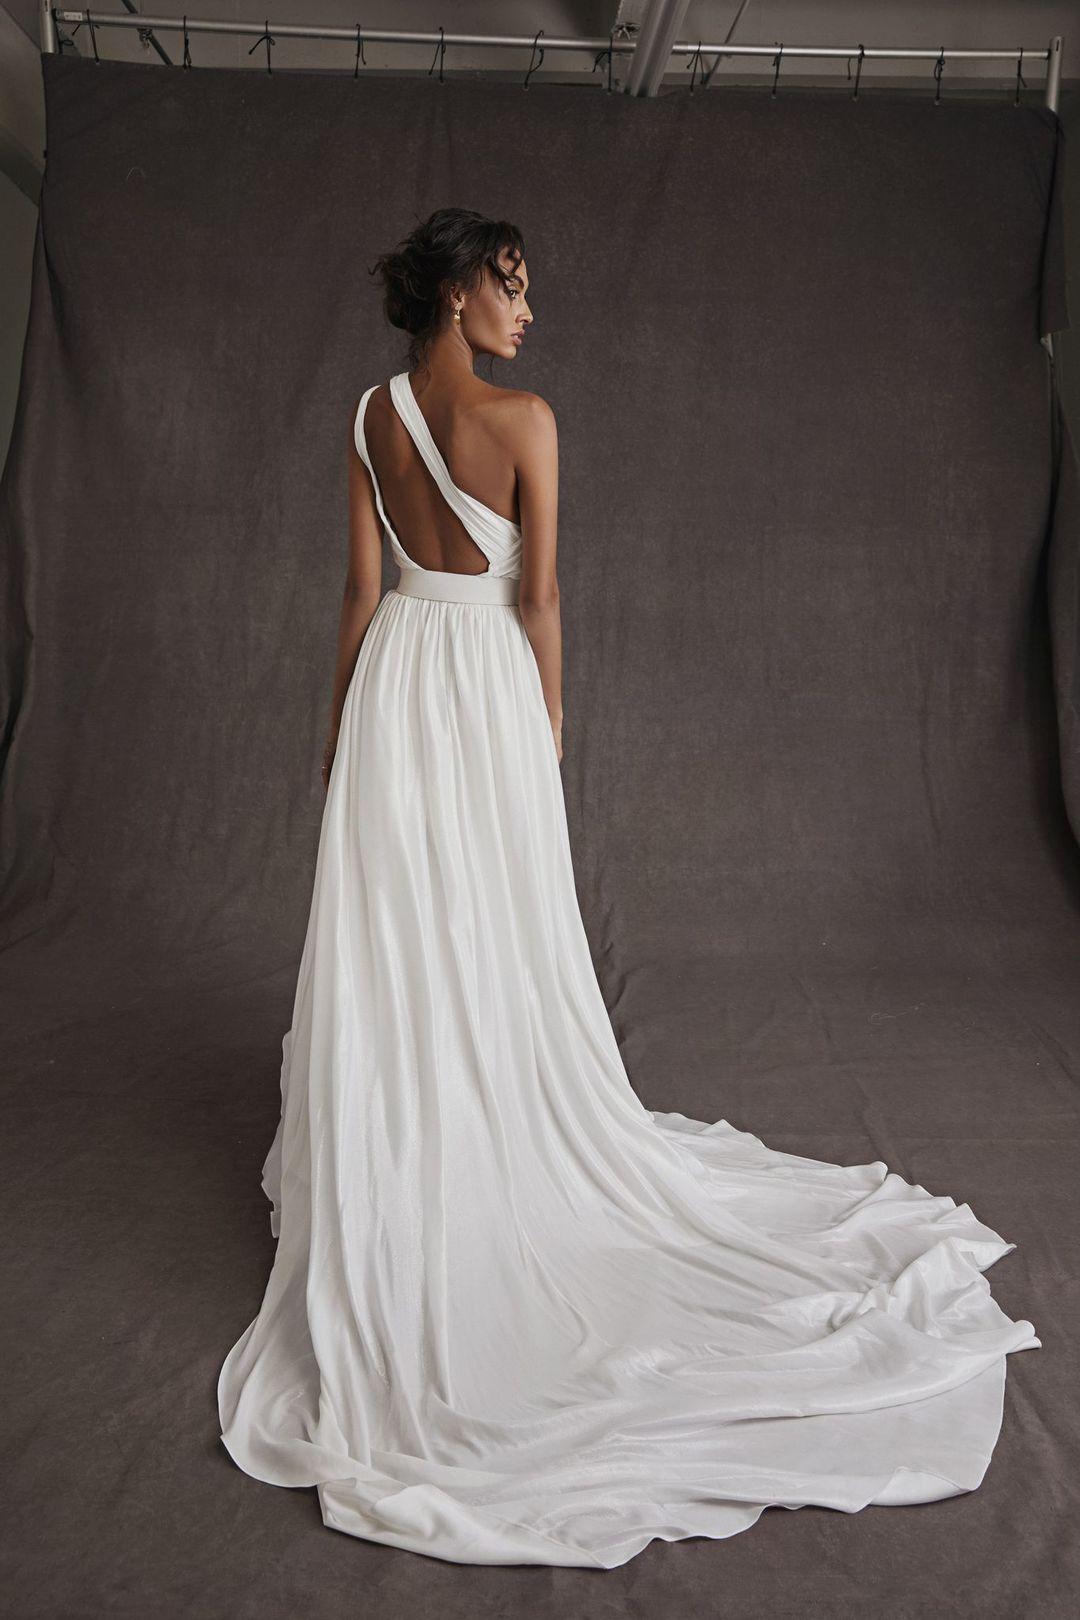 helena dress photo